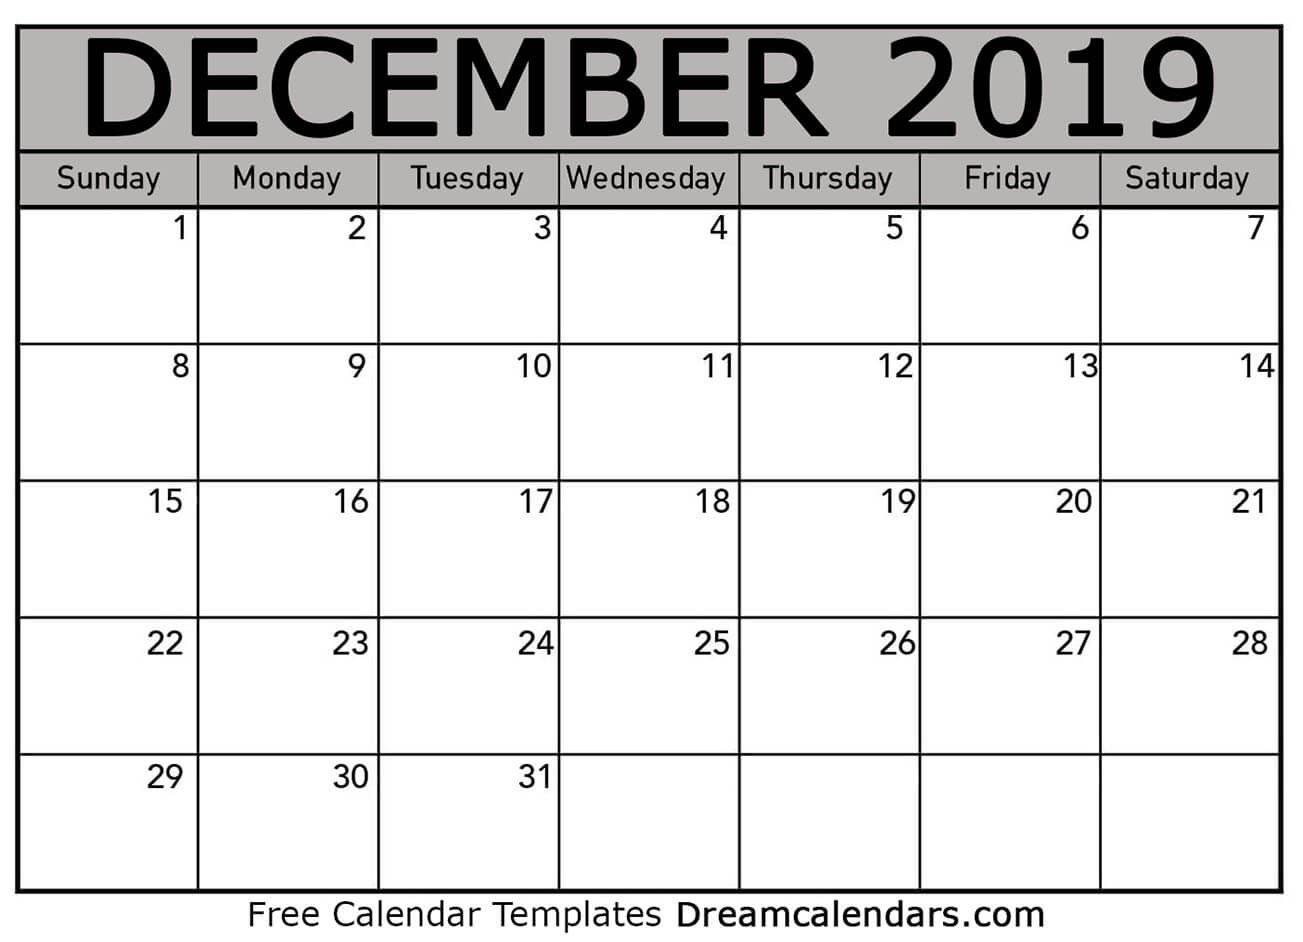 Free Printable Short Timers Calendar | Calendar Template 2020 Short Timers Calendar Printable